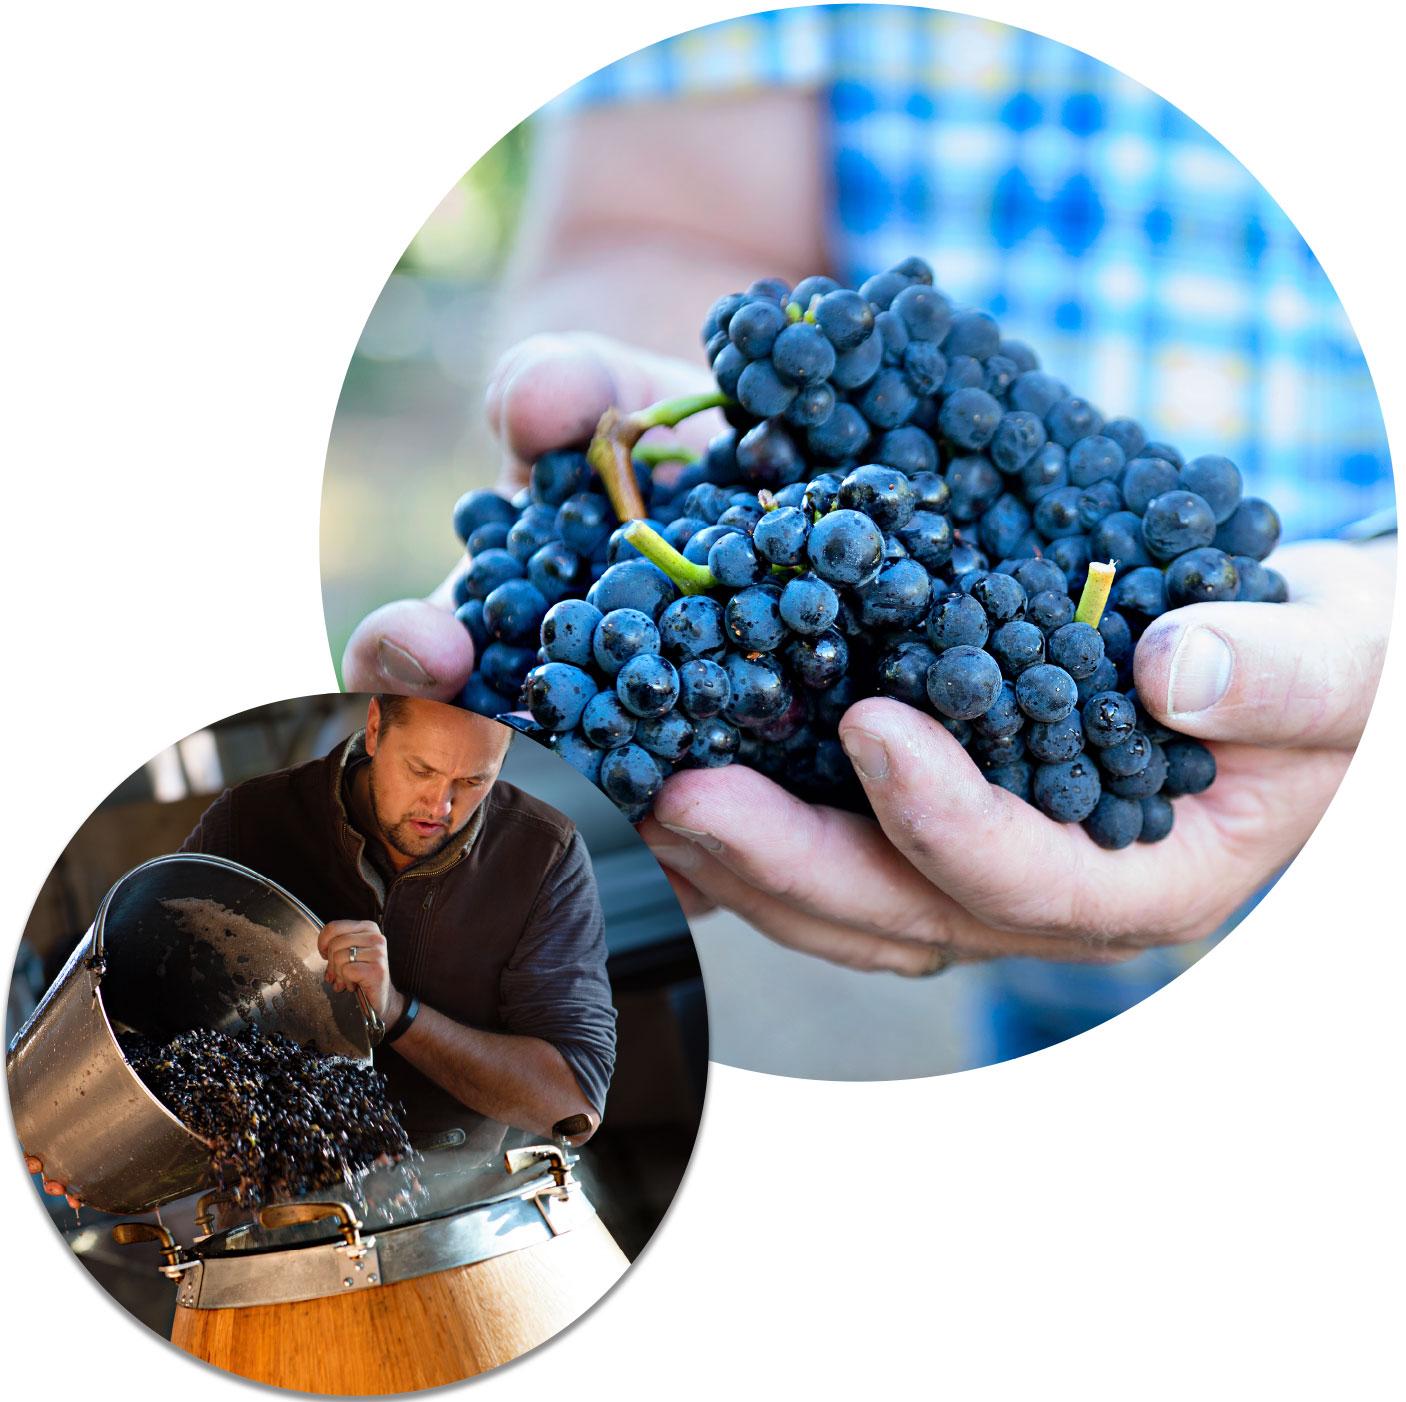 winemaking_collage.jpg